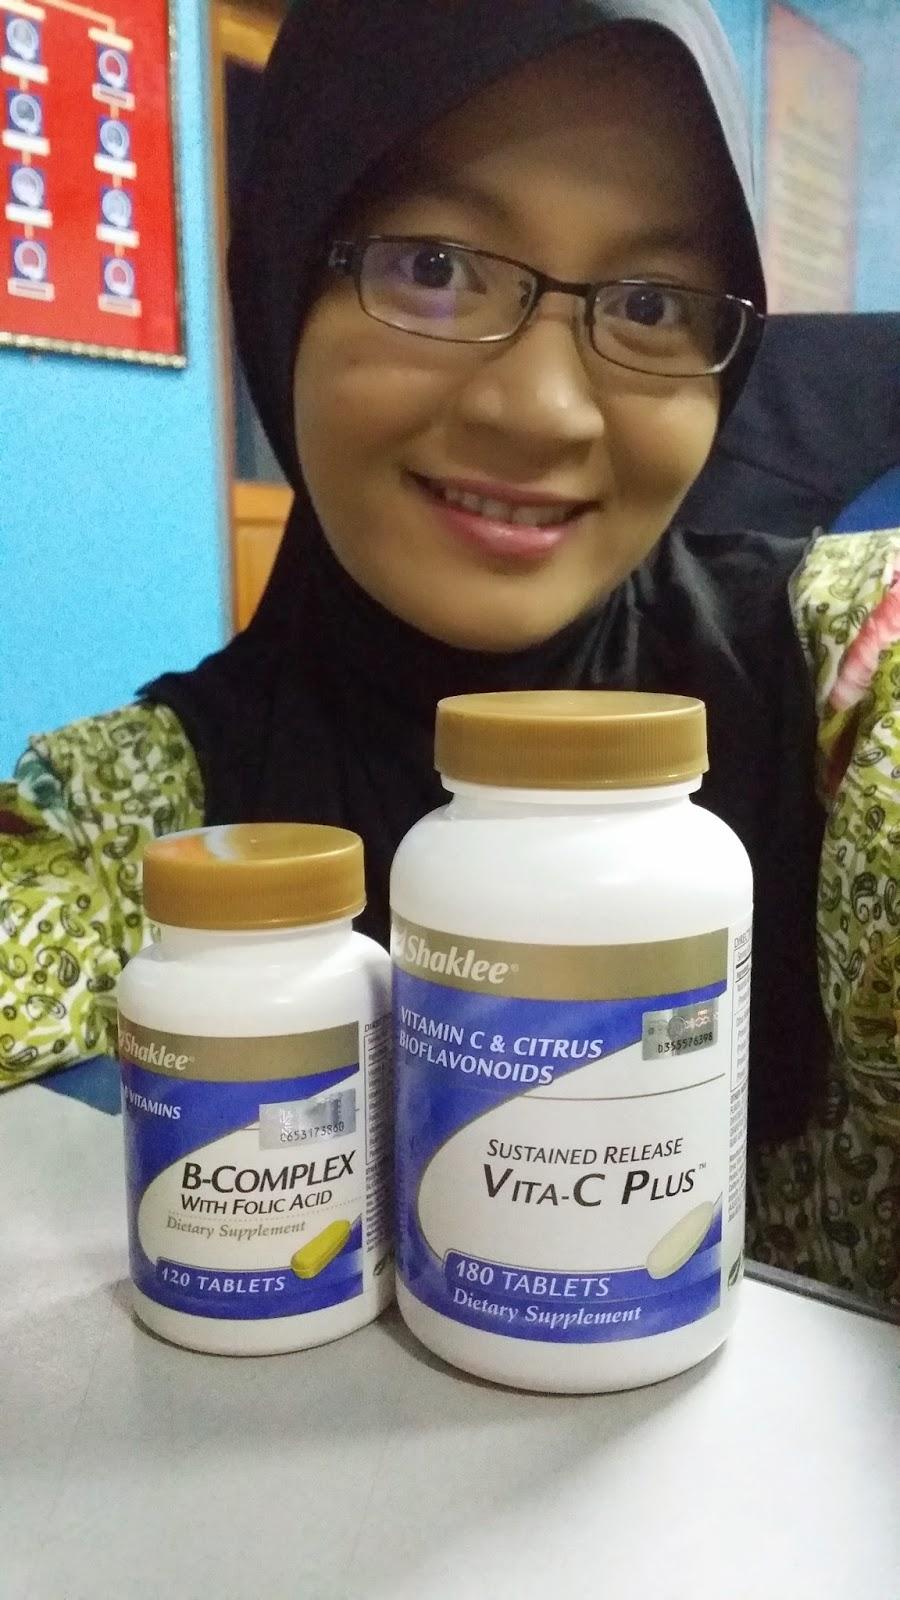 produk shaklee, shaklee murah, shaklee, harga b-complex shaklee, harga vitamin c shaklee, beli produk shaklee dengan murah, review,